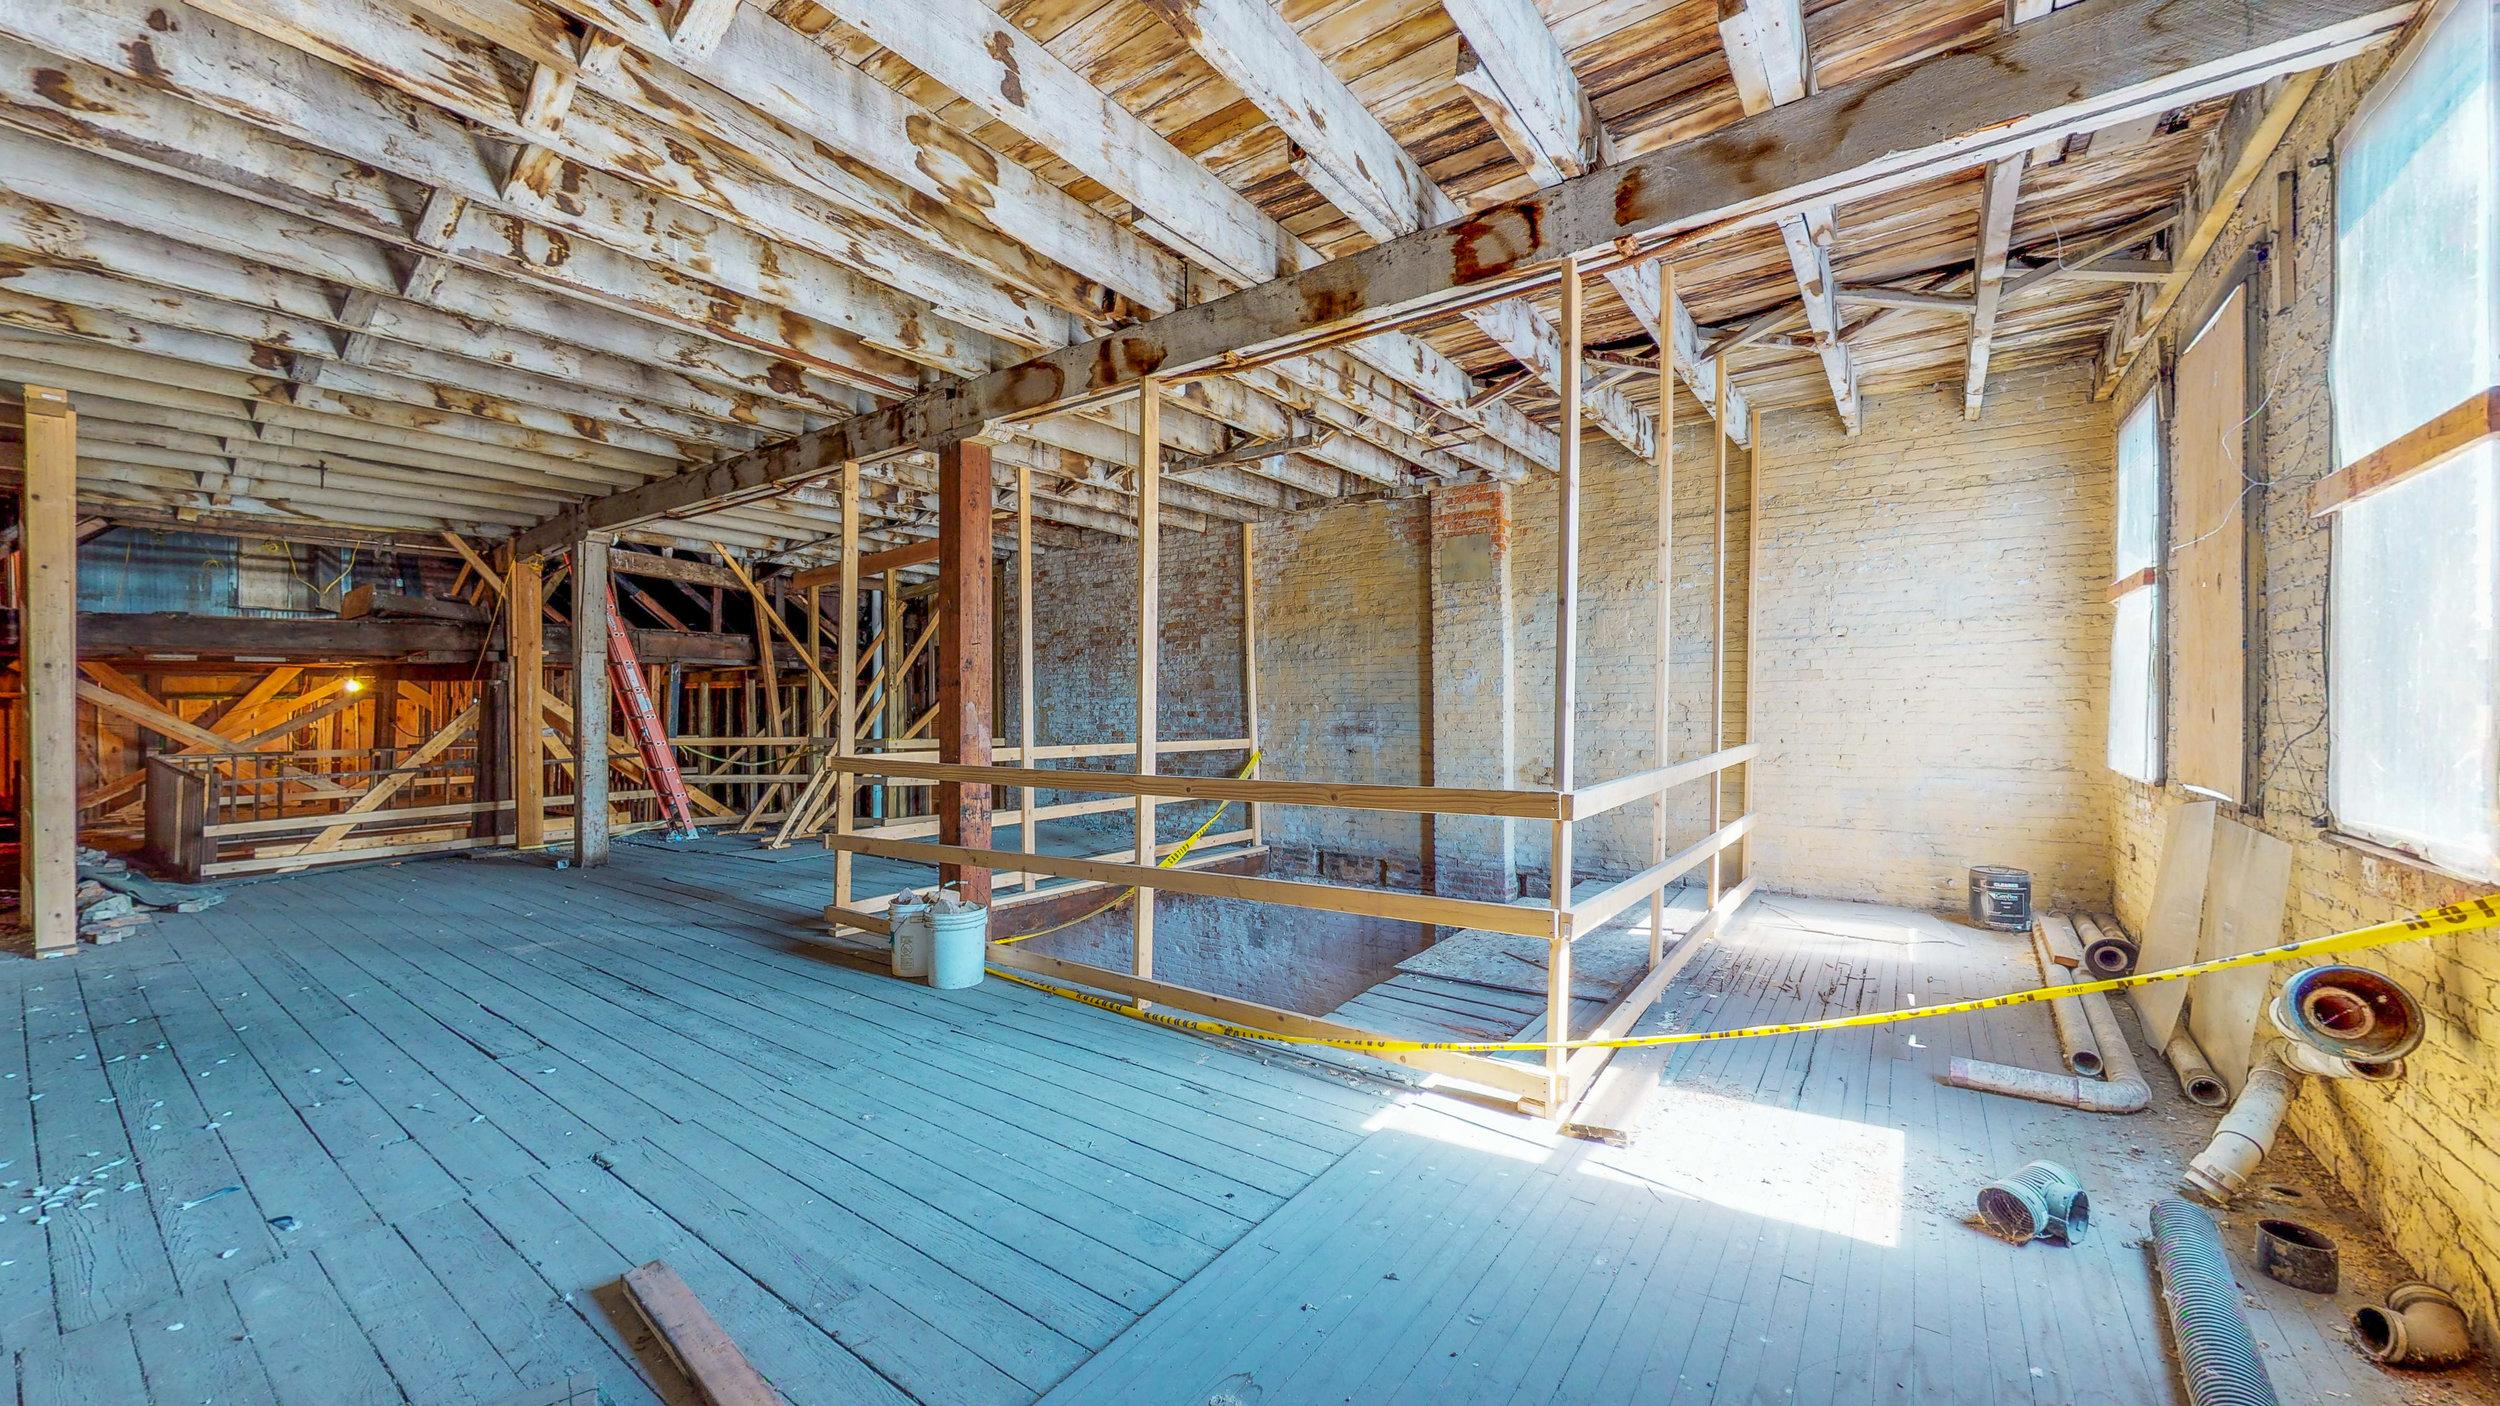 The-Van-Ostrande-Radliff-House-at-48-Hudson-08292019_123612.jpg